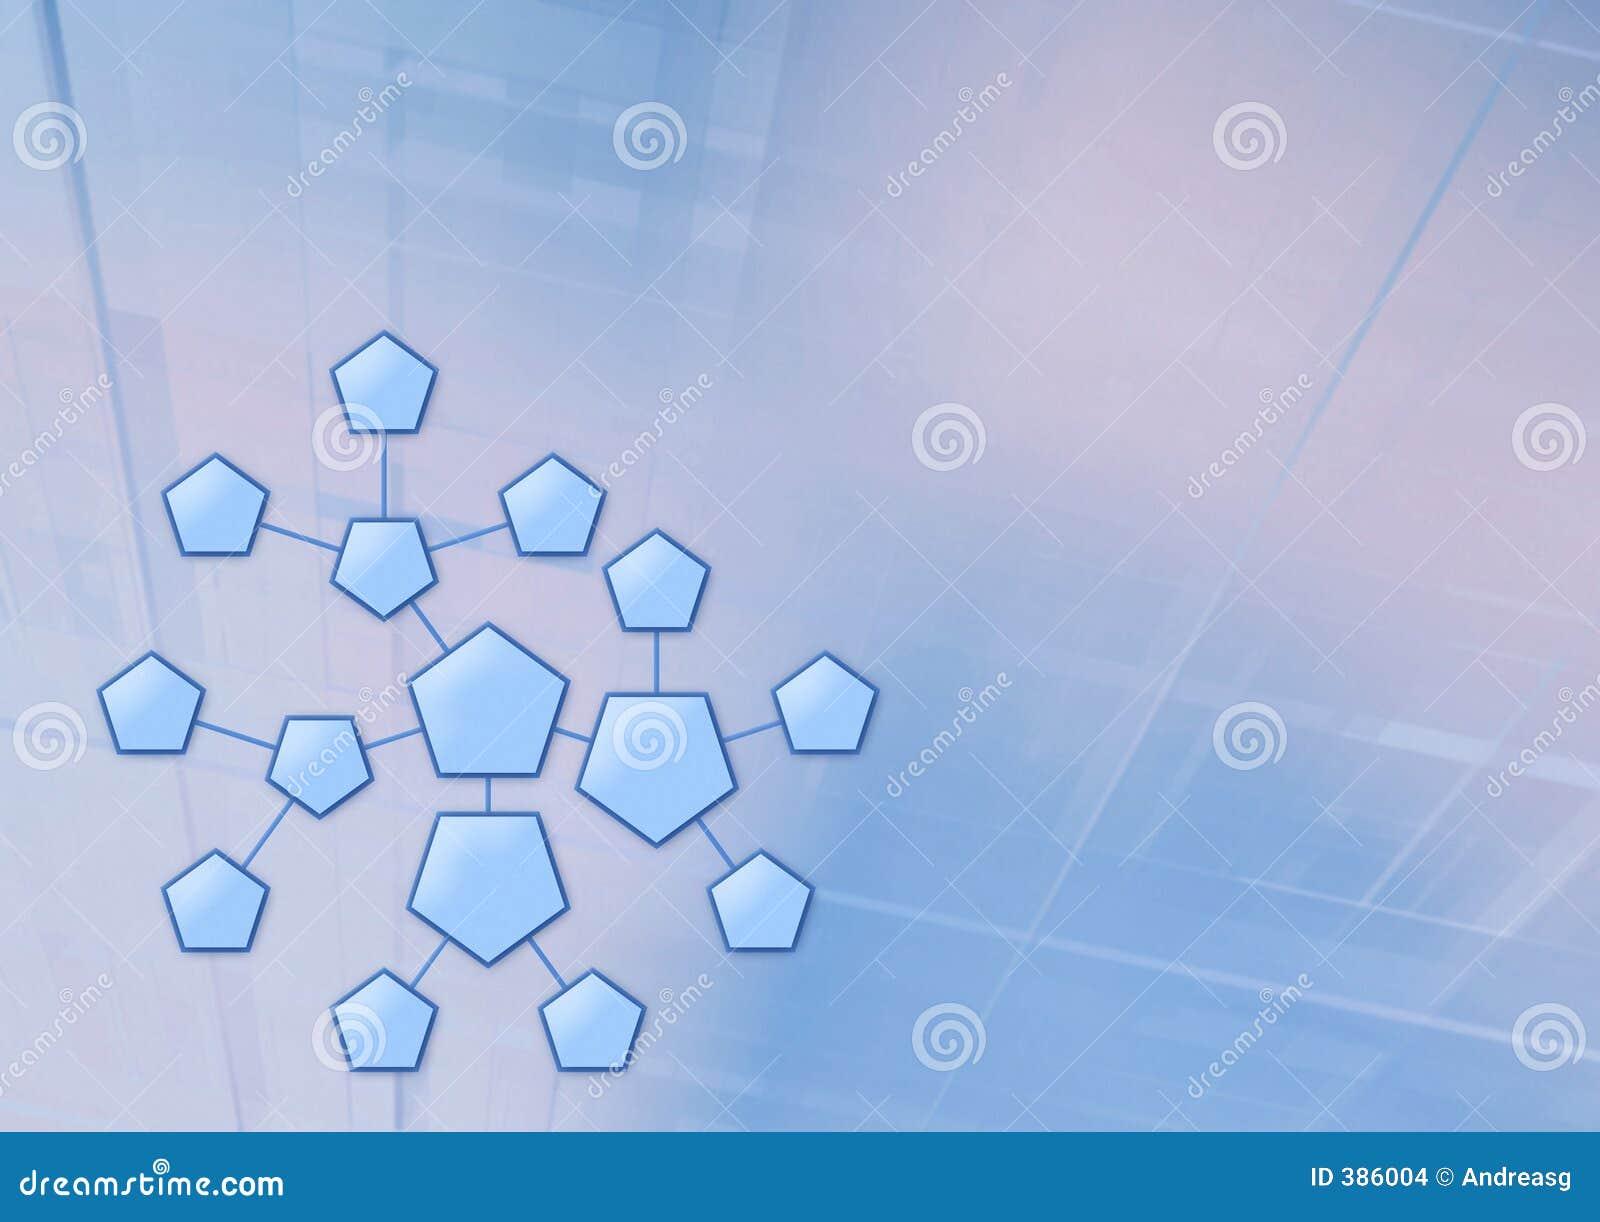 Hexagon systeem